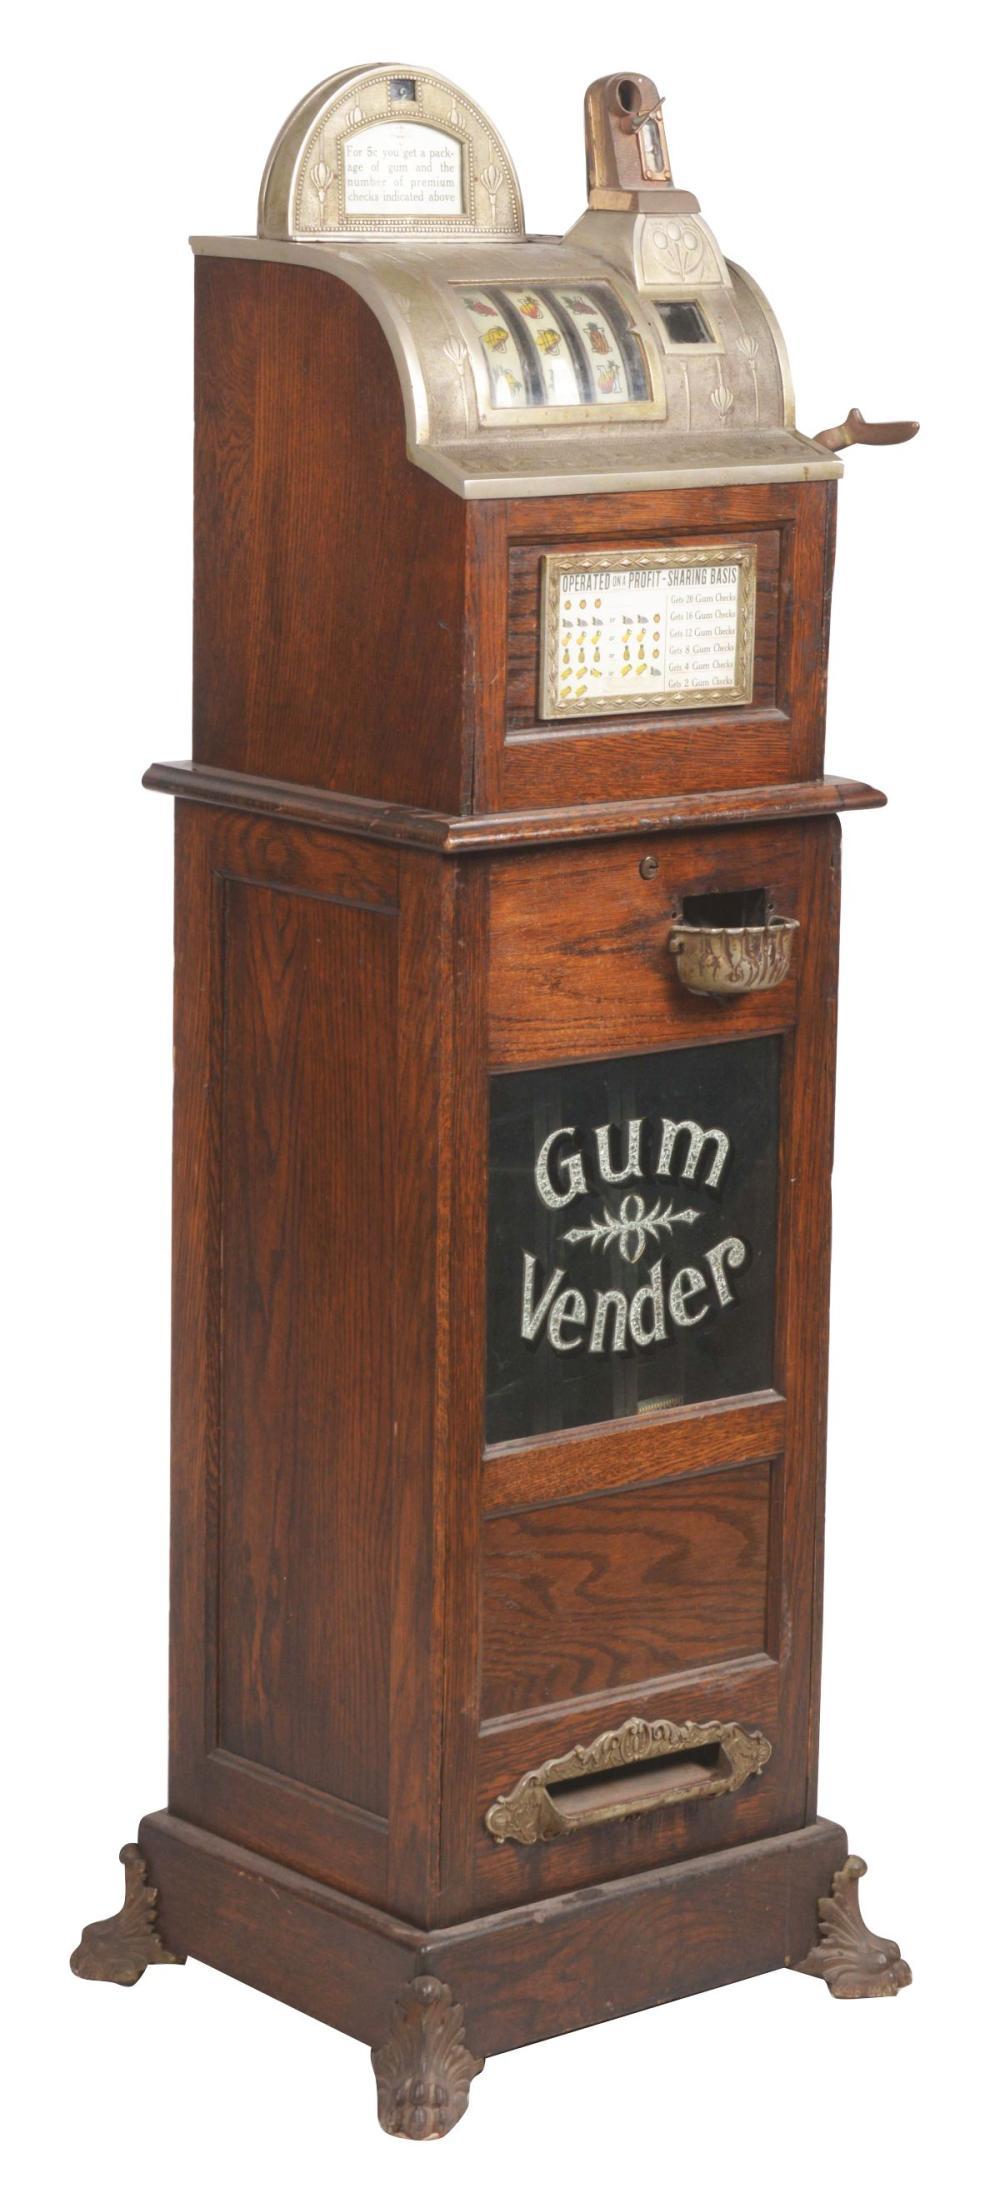 5¢ WATLING AUTOMATIC OK GUM VENDOR SLOT MACHINE.